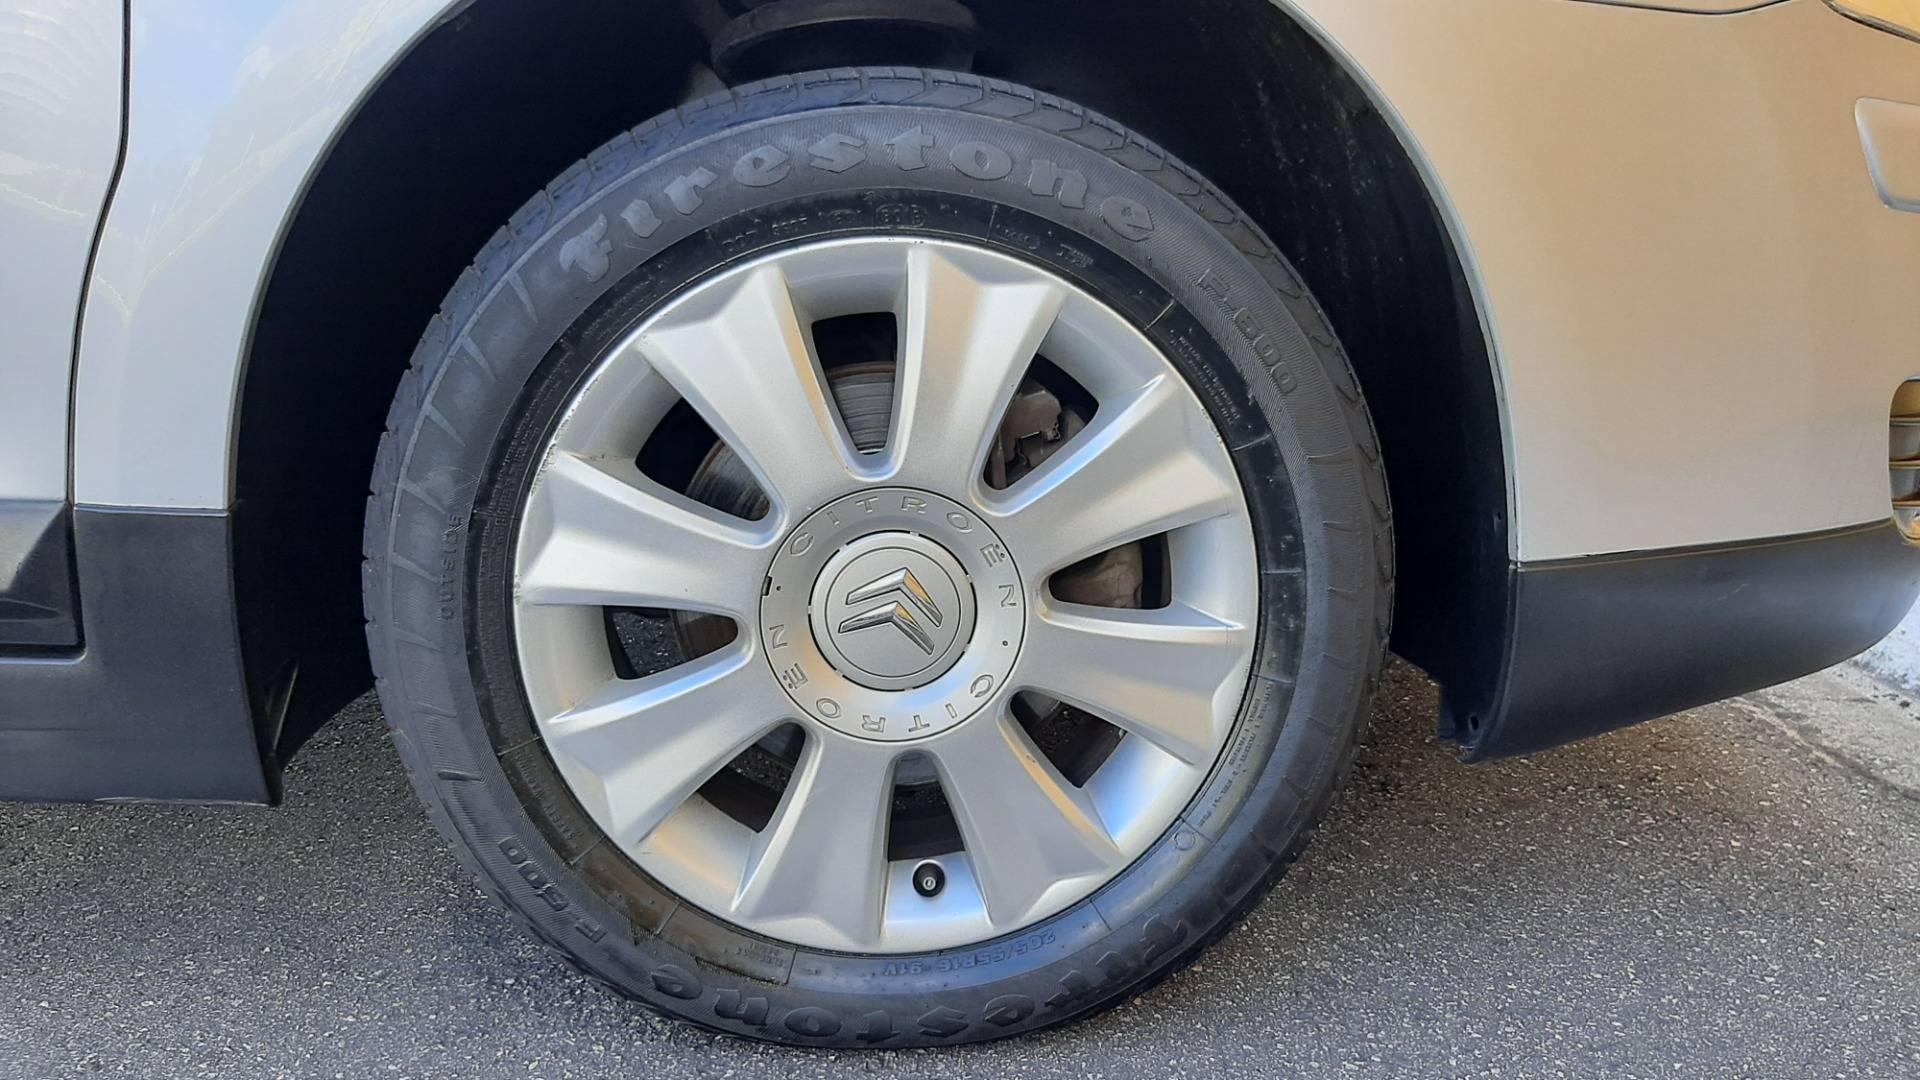 CITROEN C4 Sedan 2.0 16V 4P GLX PALLAS FLEX, Foto 14